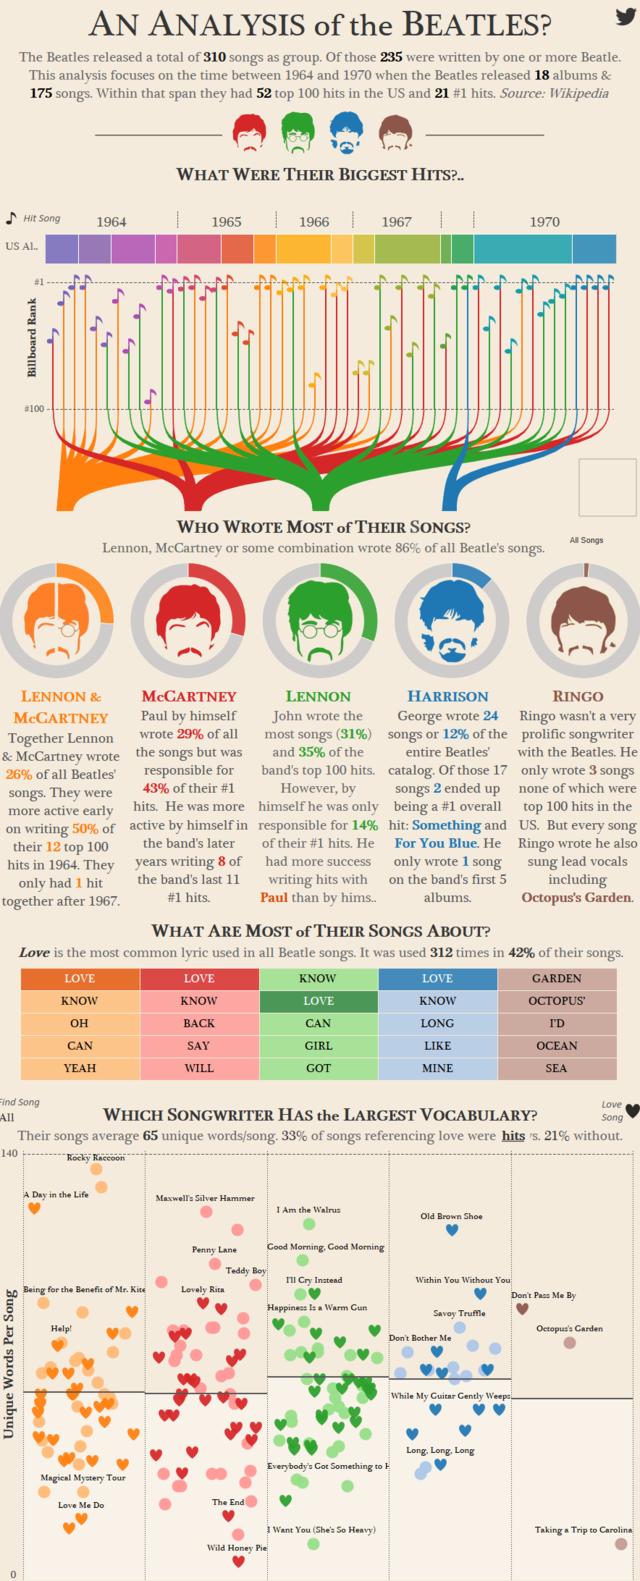 Beatles Analysis.png